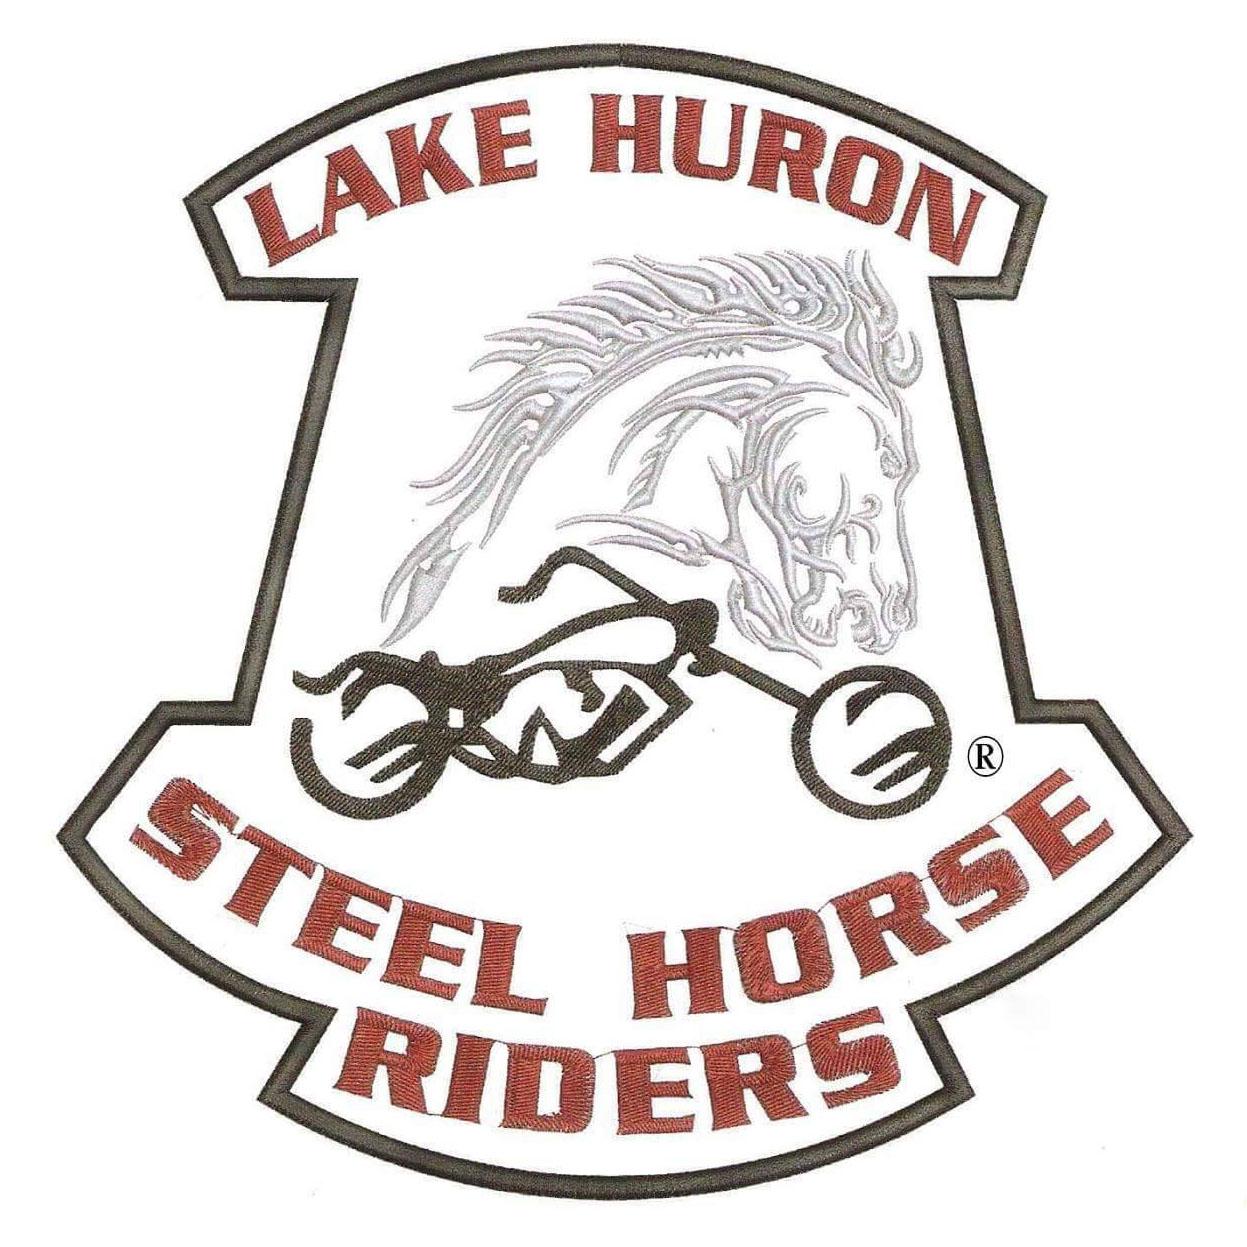 Steel Horse Riders